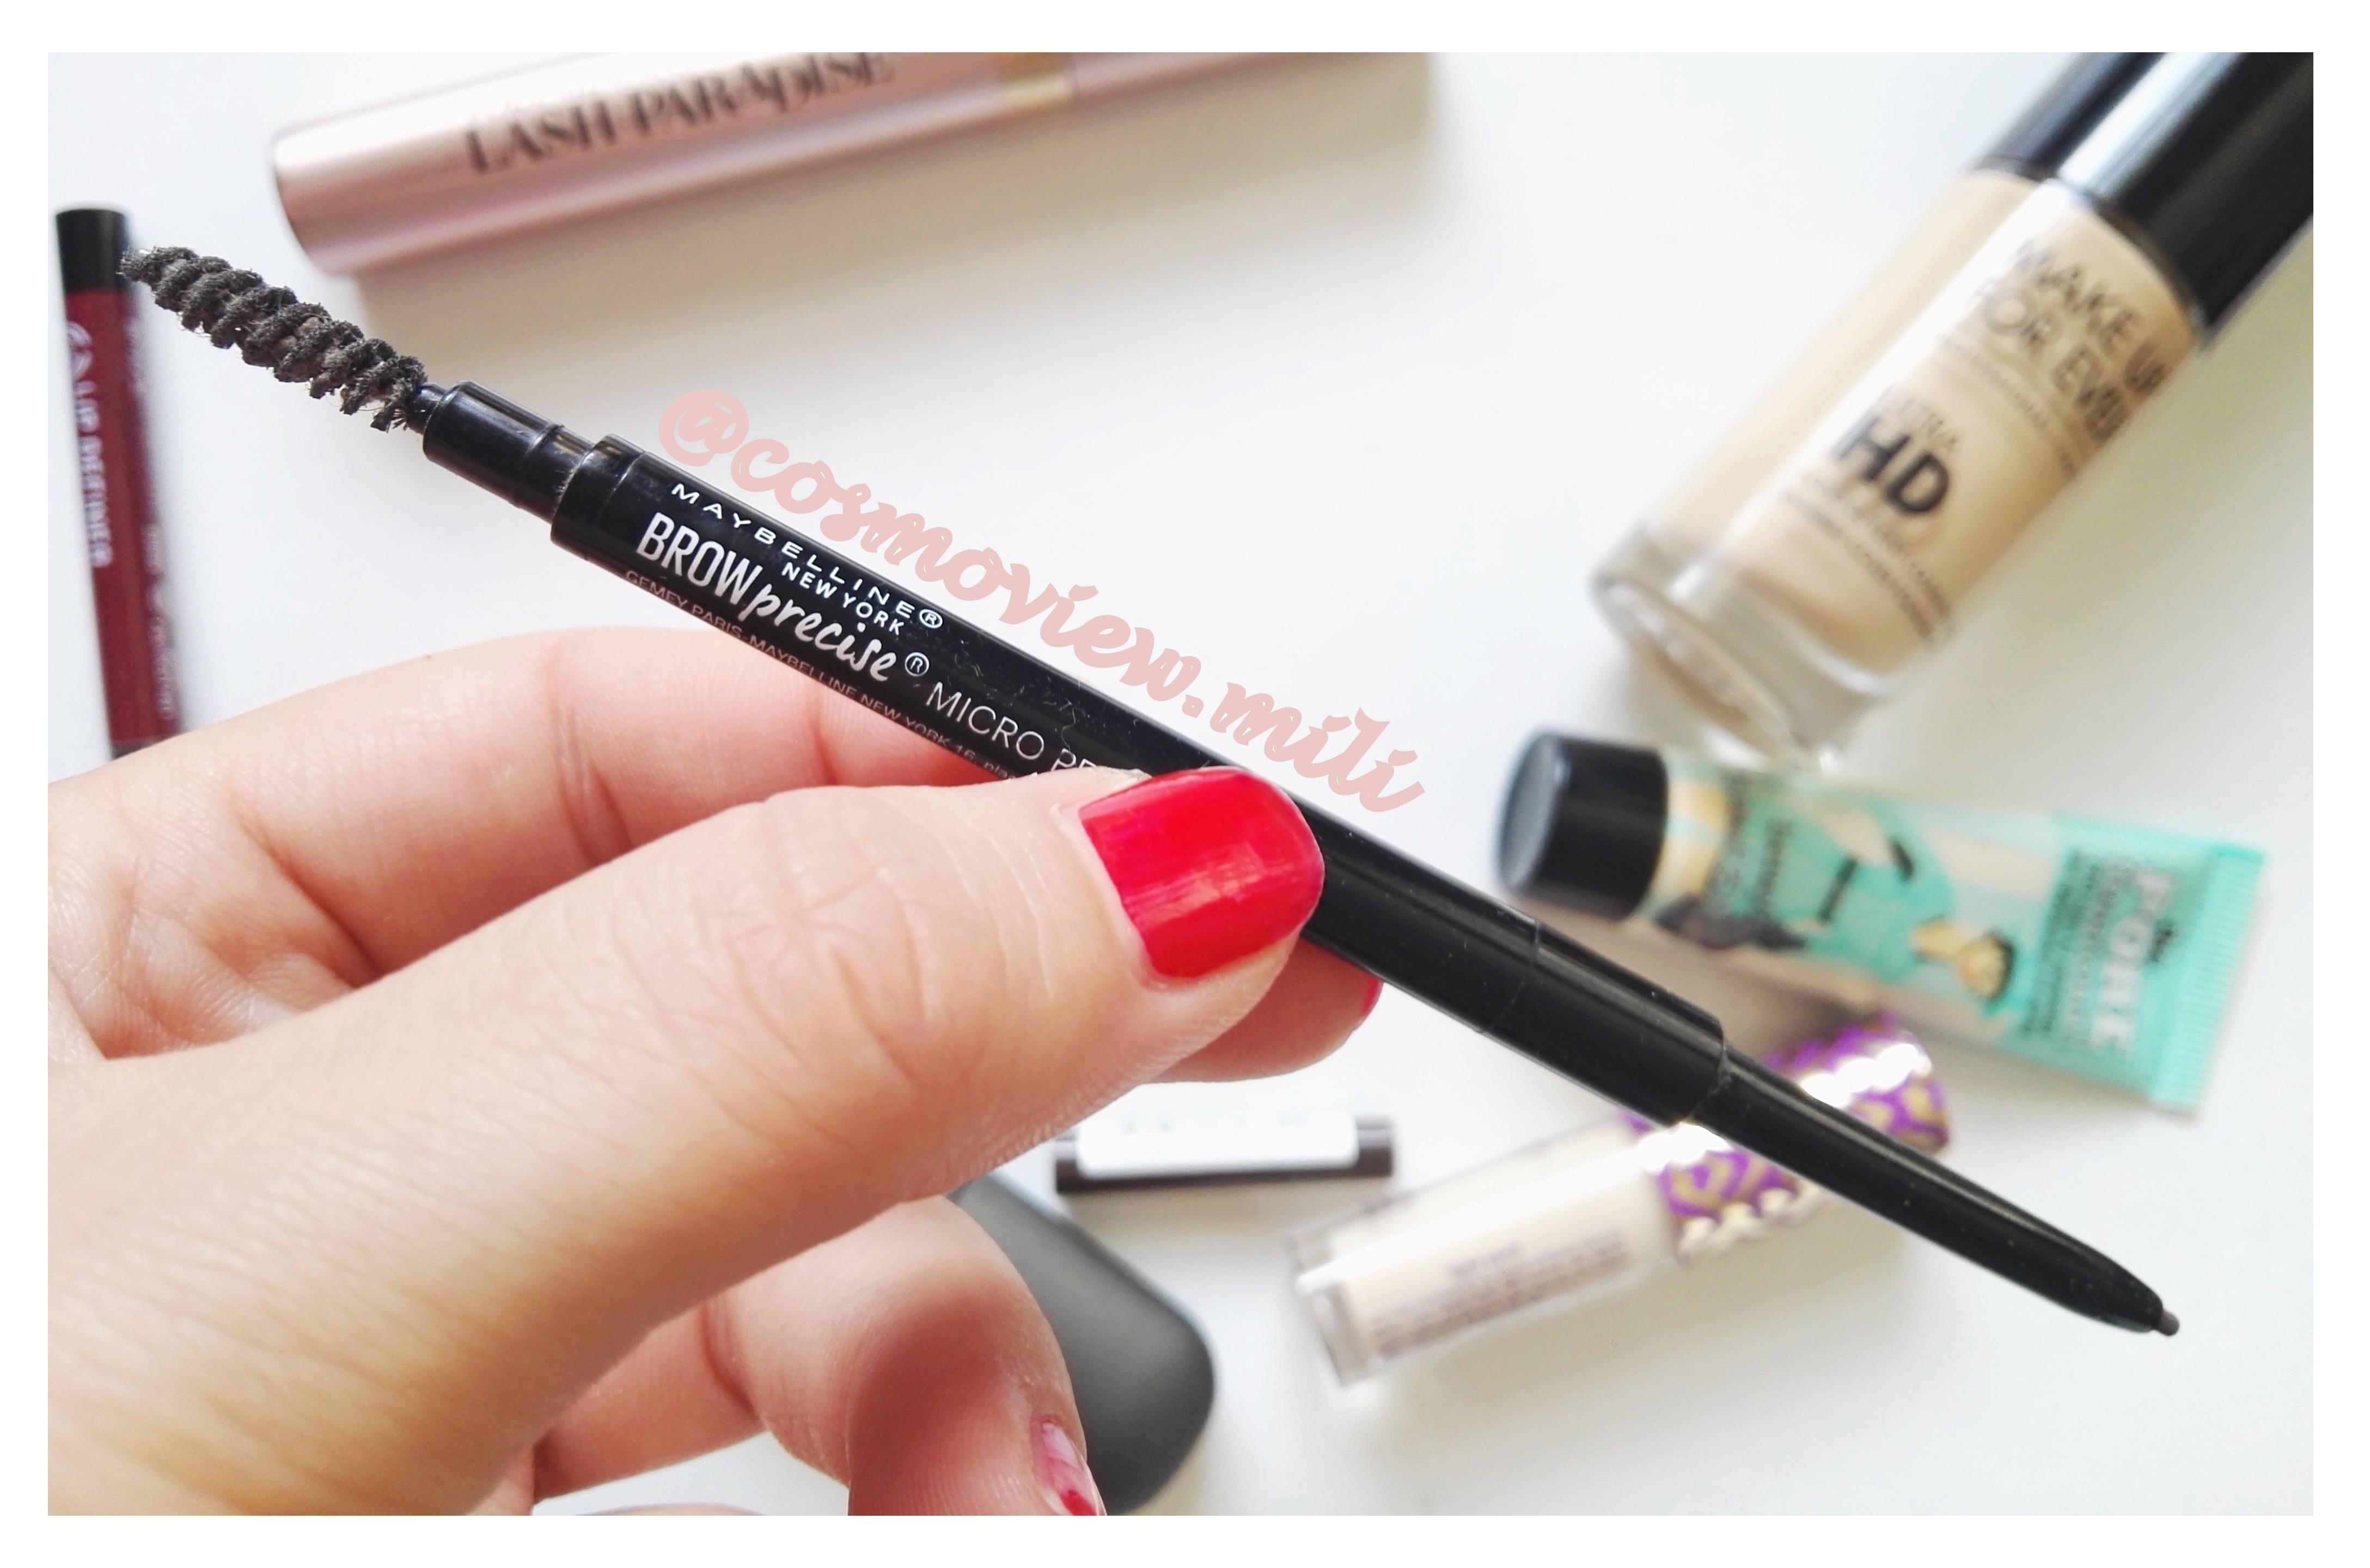 maybelline new york brow precise micro pencil reviews in eyebrow care chickadvisor